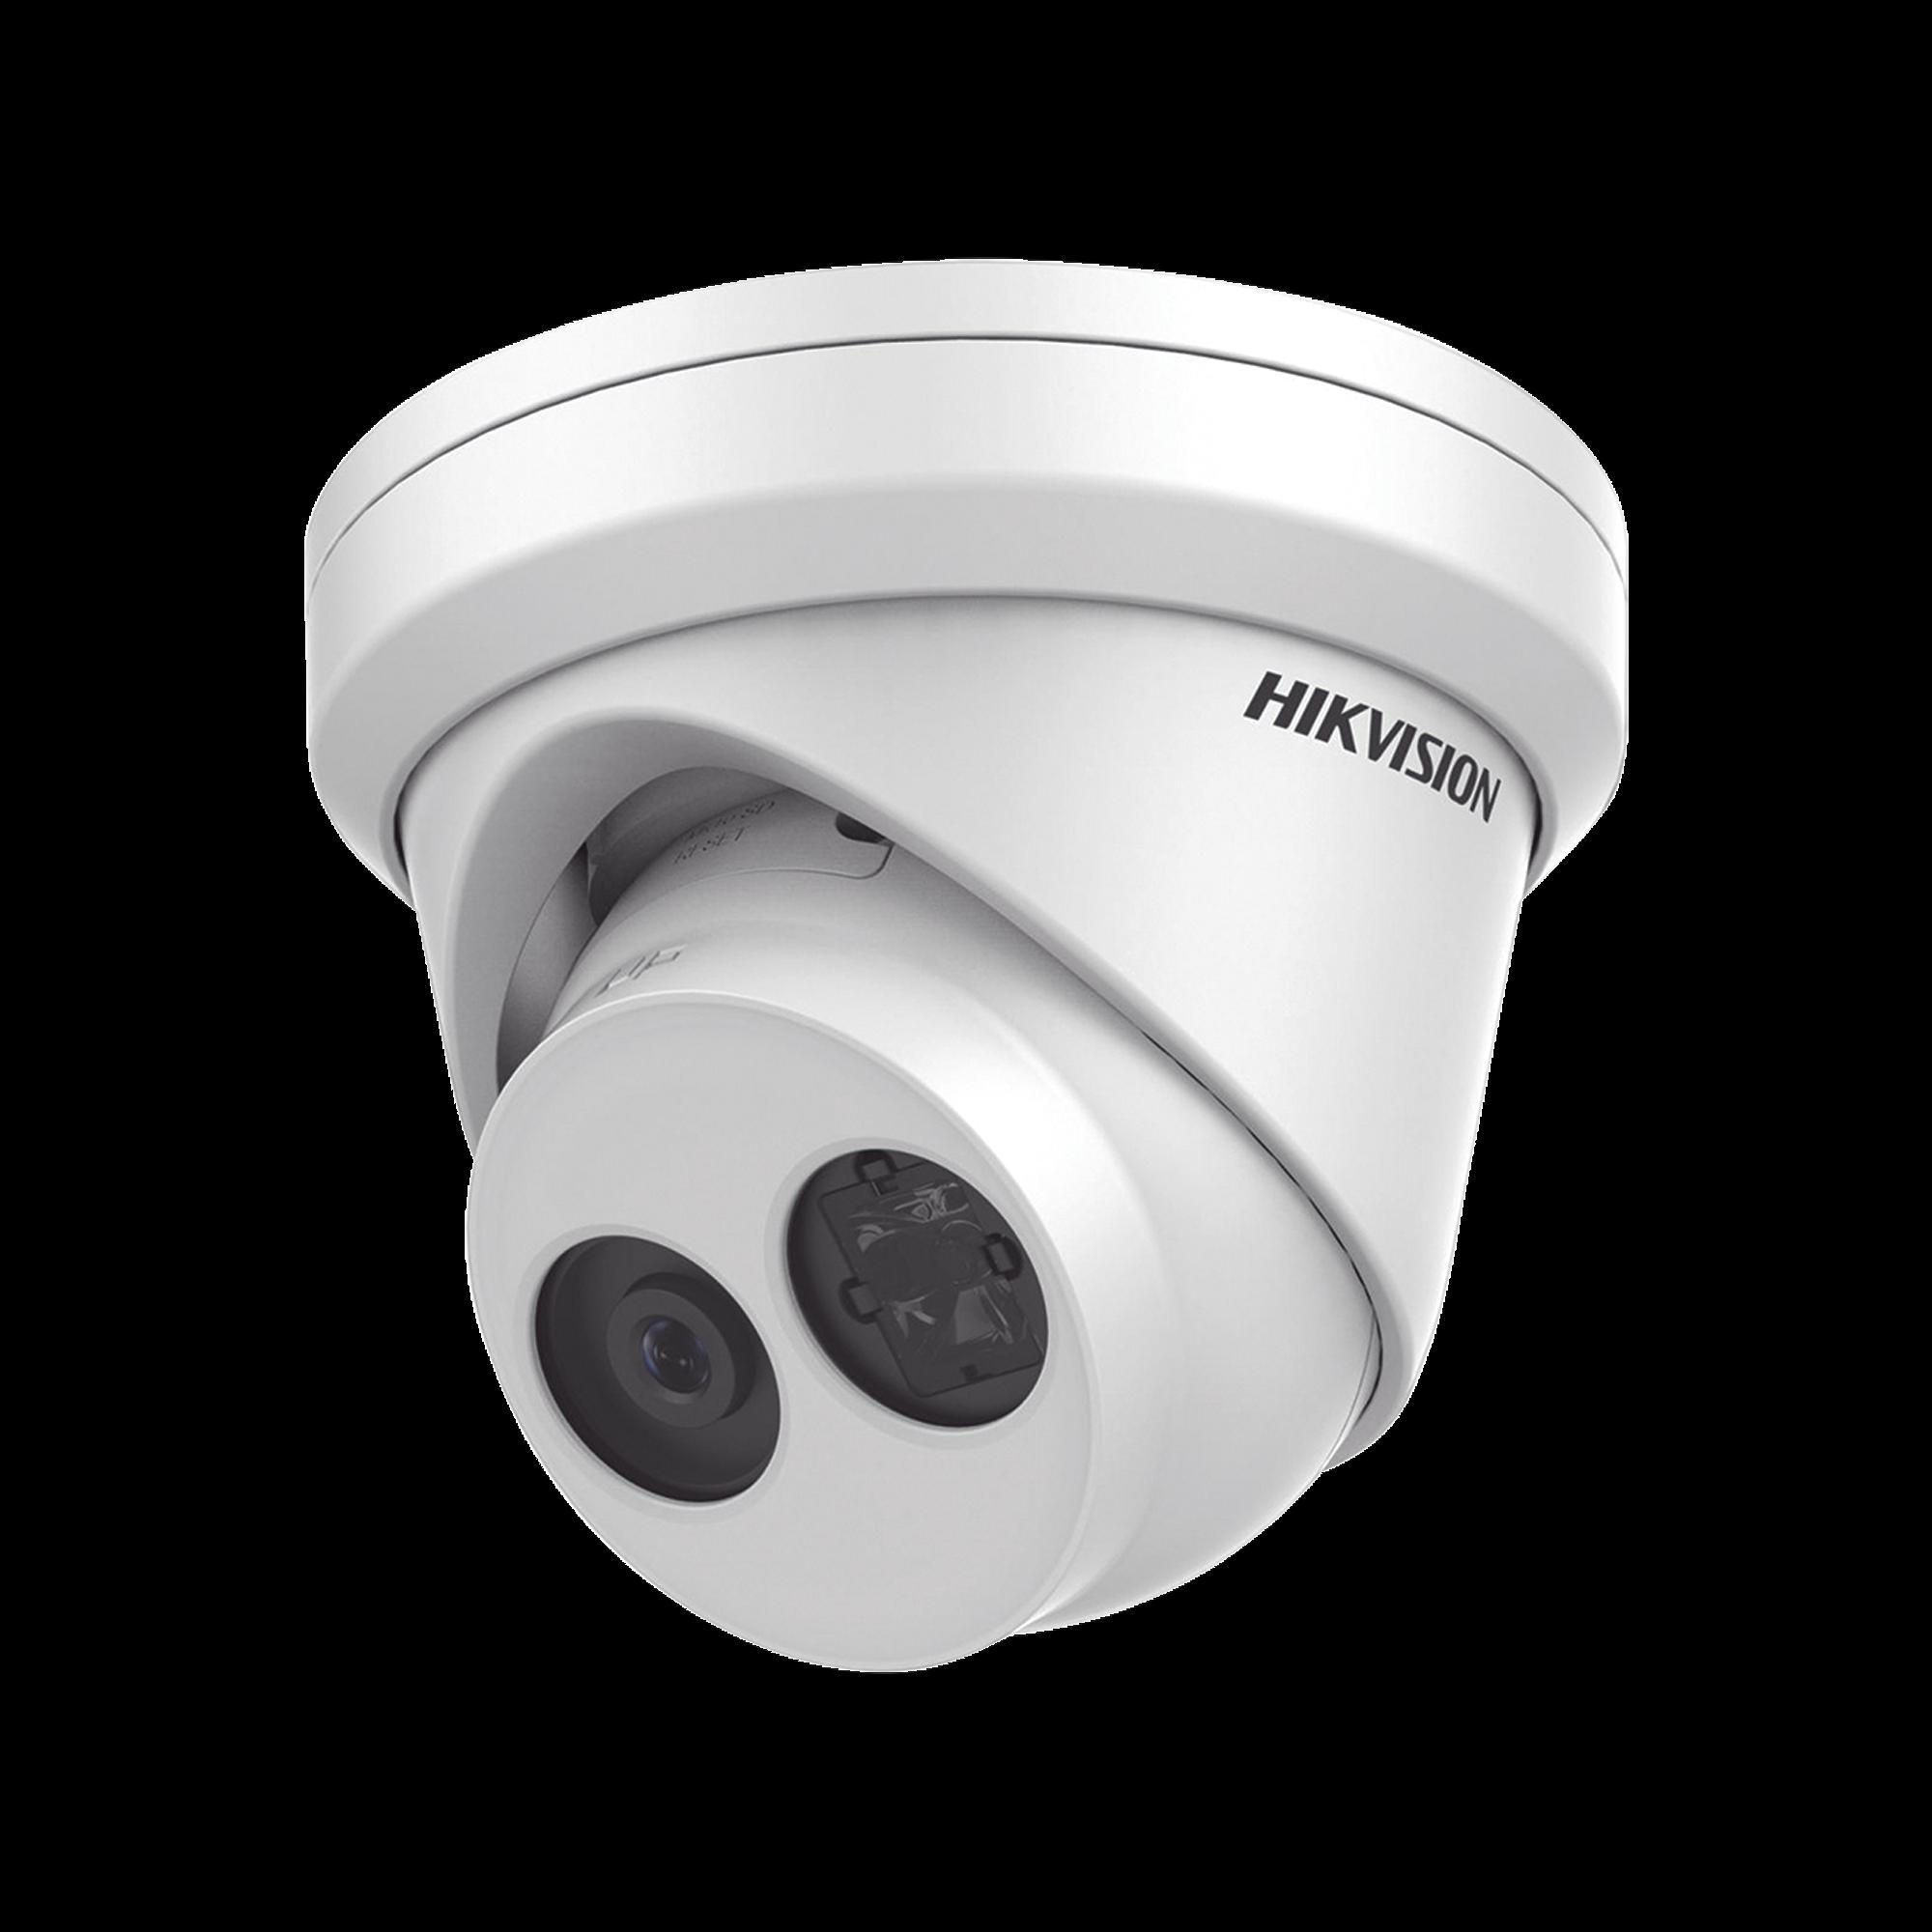 Turret IP 6 Megapixel / 30 mts IR EXIR / Exterior IP67 / WDR 120 dB / PoE / Lente 2.8 mm / Videoanaliticos Integrados